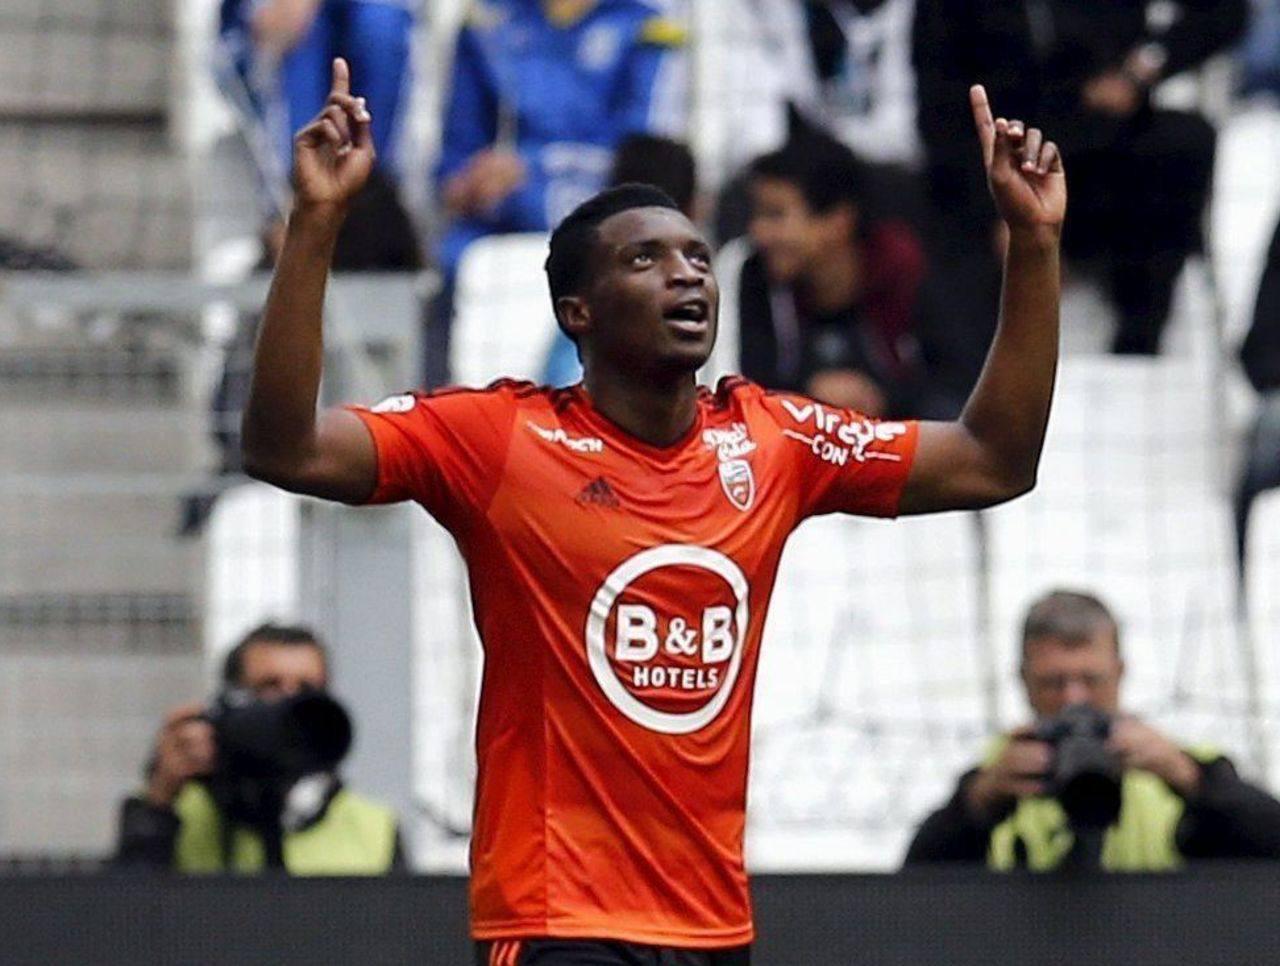 Lorient Angers Maçı İddaa Tahmini ve Yorumu 6 Mayıs 2017